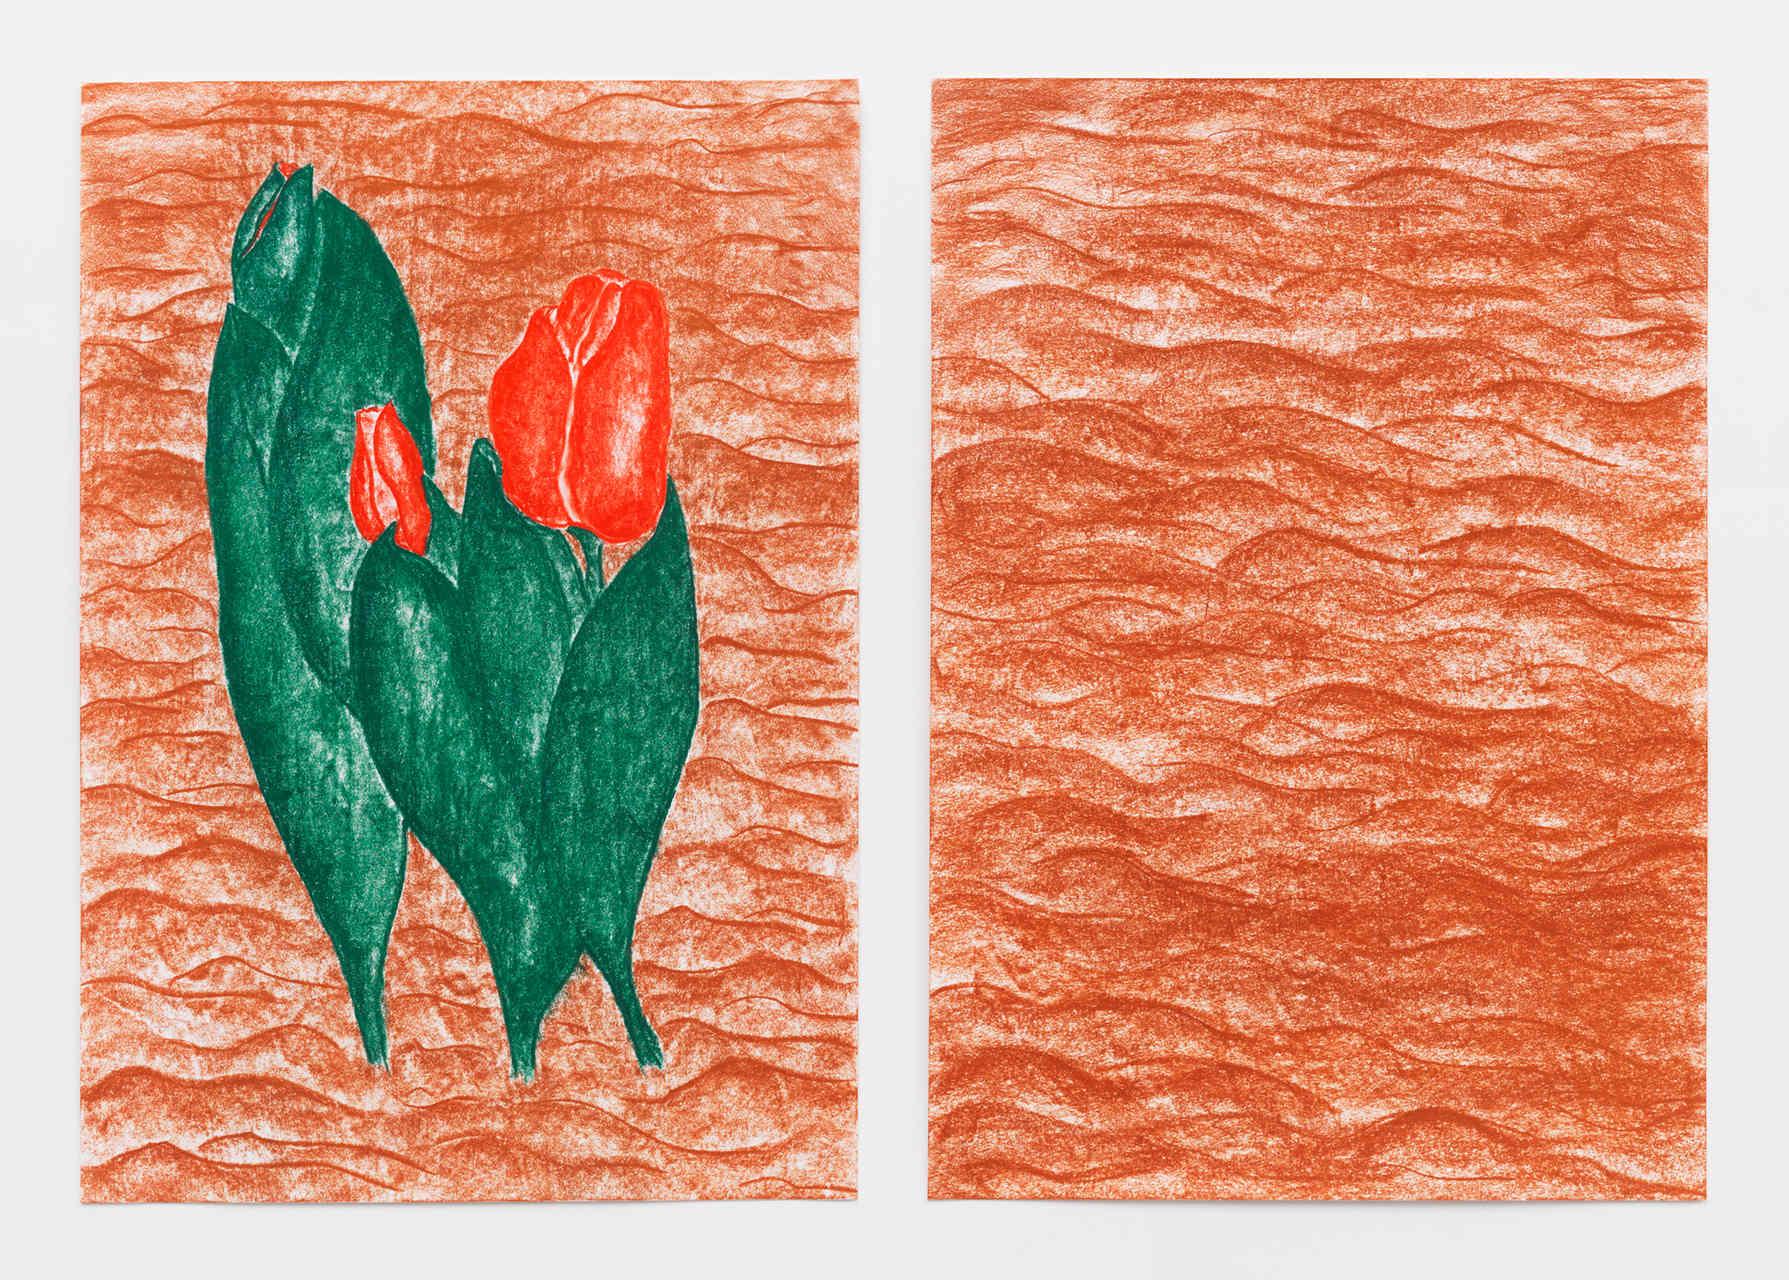 7.Tomorrow_Some-Versions-of-Pastoral-Jutta-Zimmermann